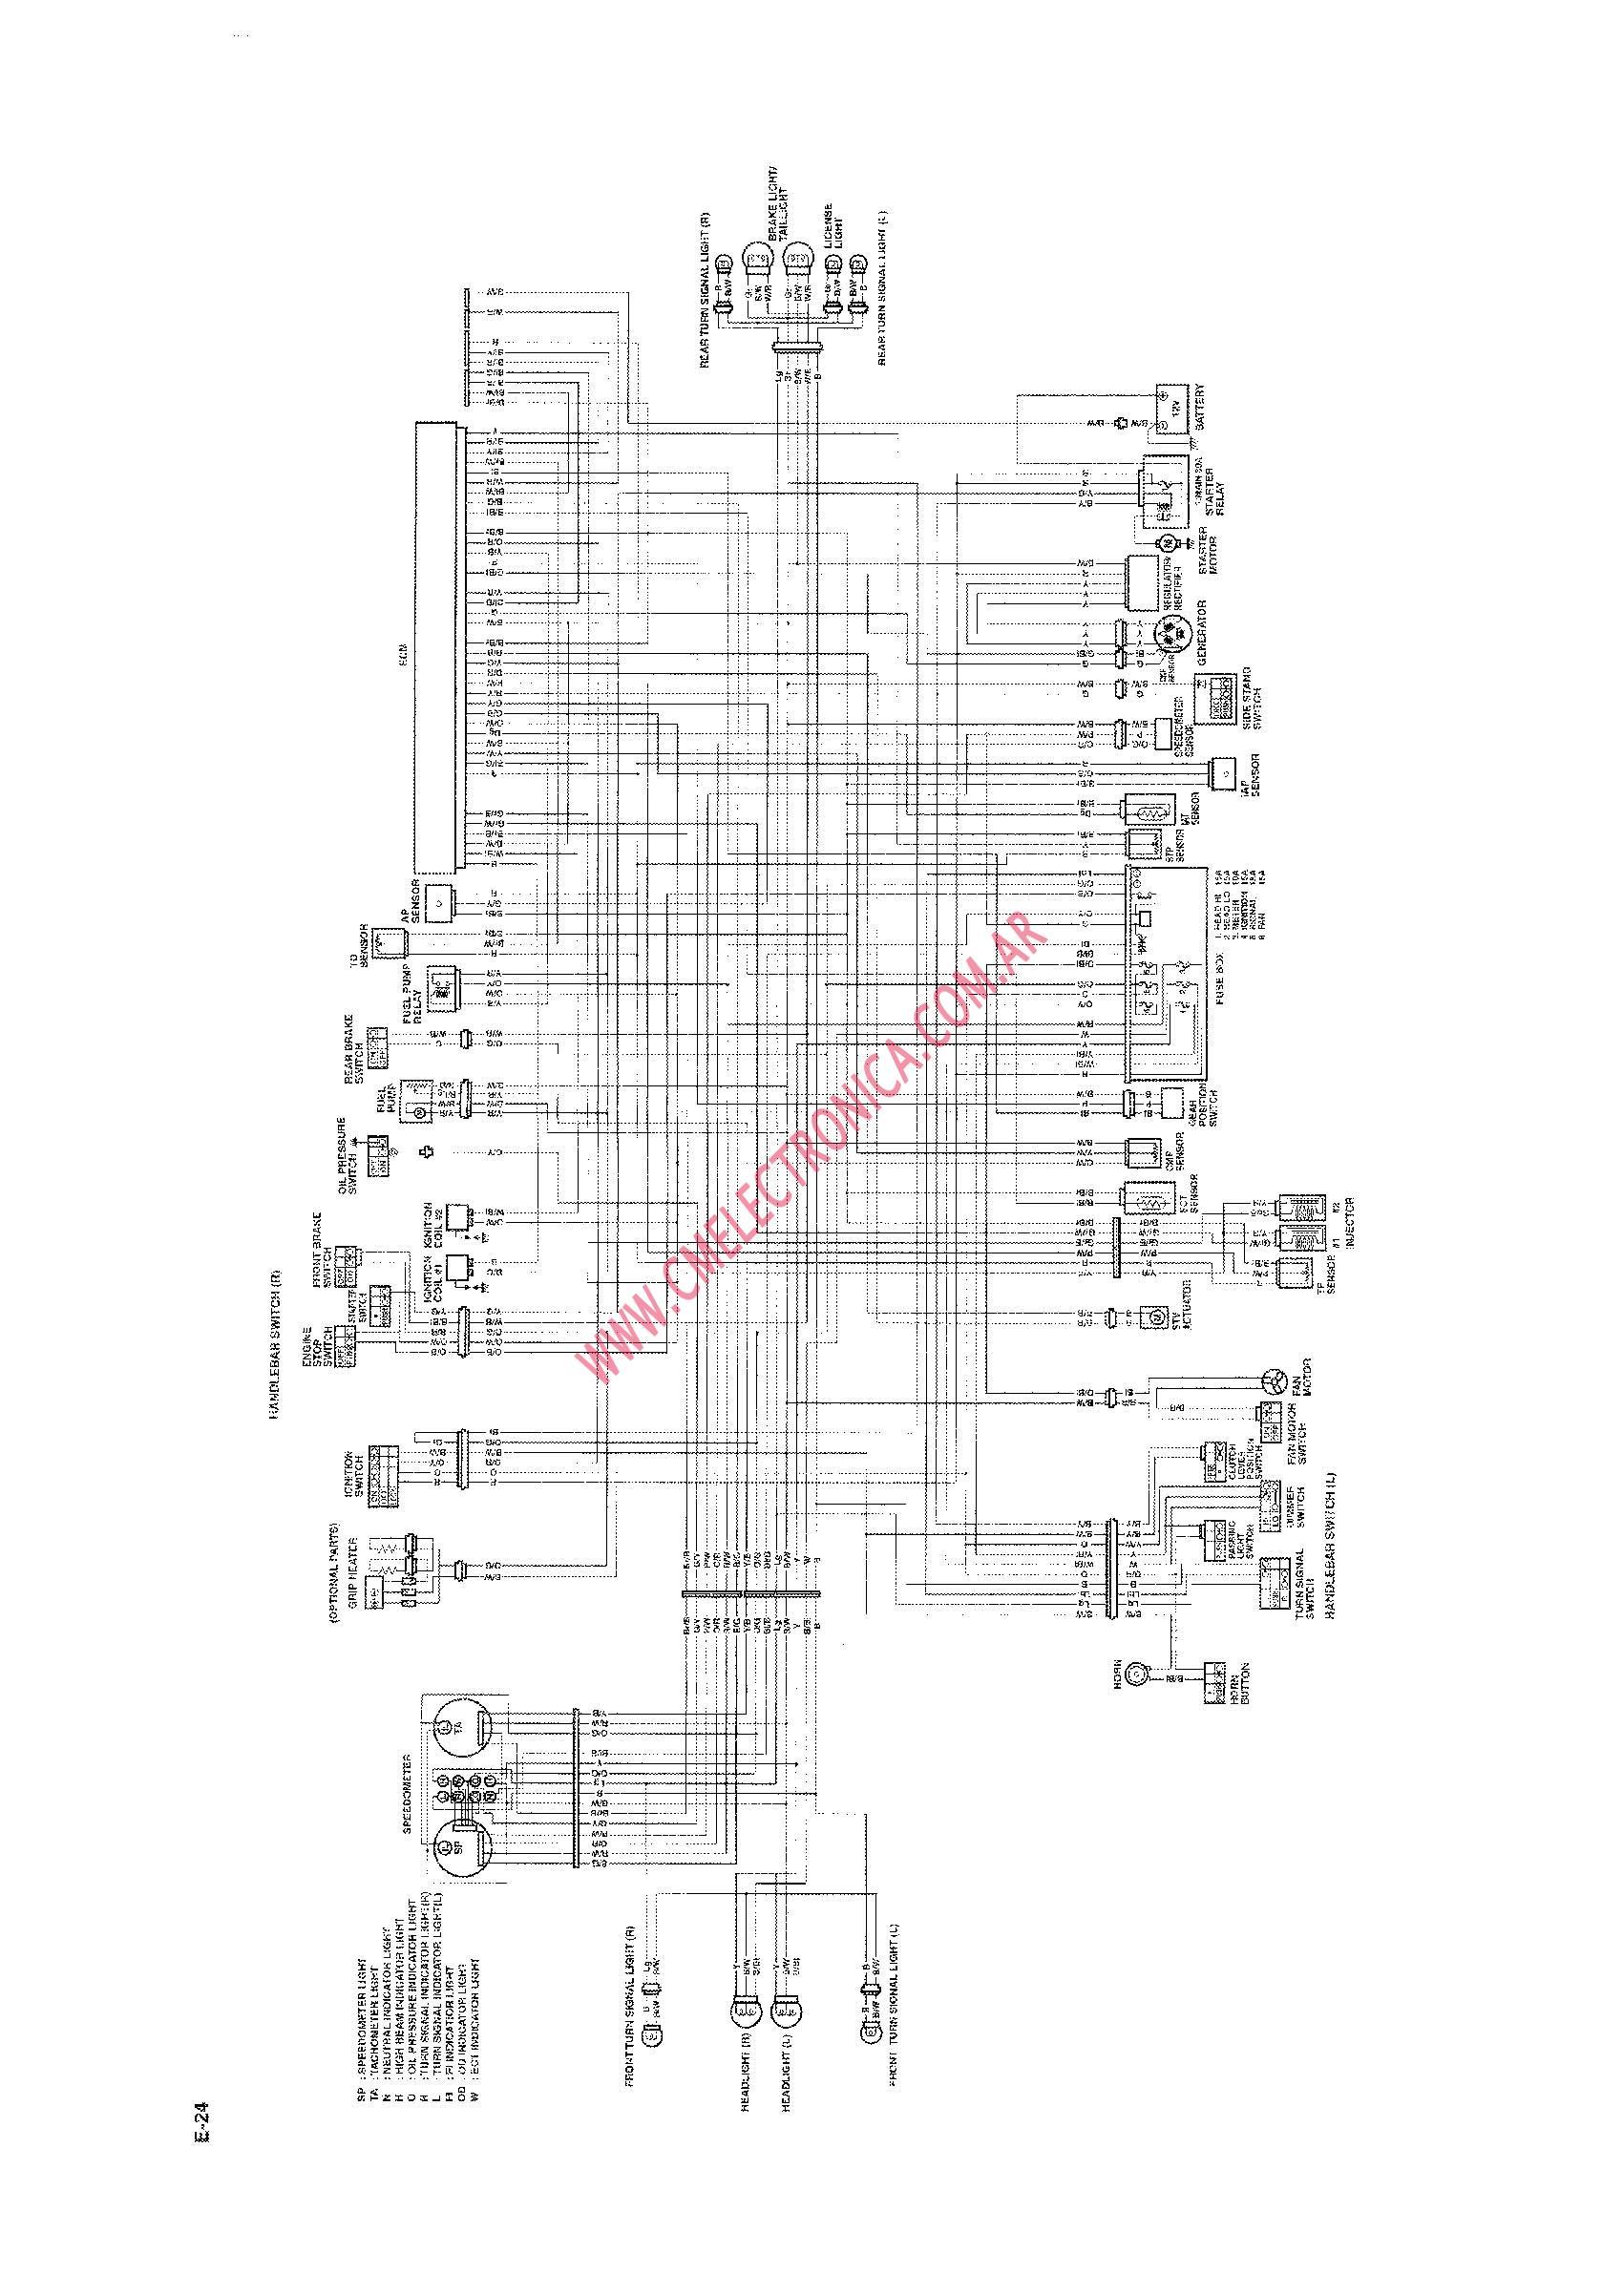 96 Seadoo Wiring Diagram Get Free Image About Auto Sea Doo 1997 Xp Fuse Box